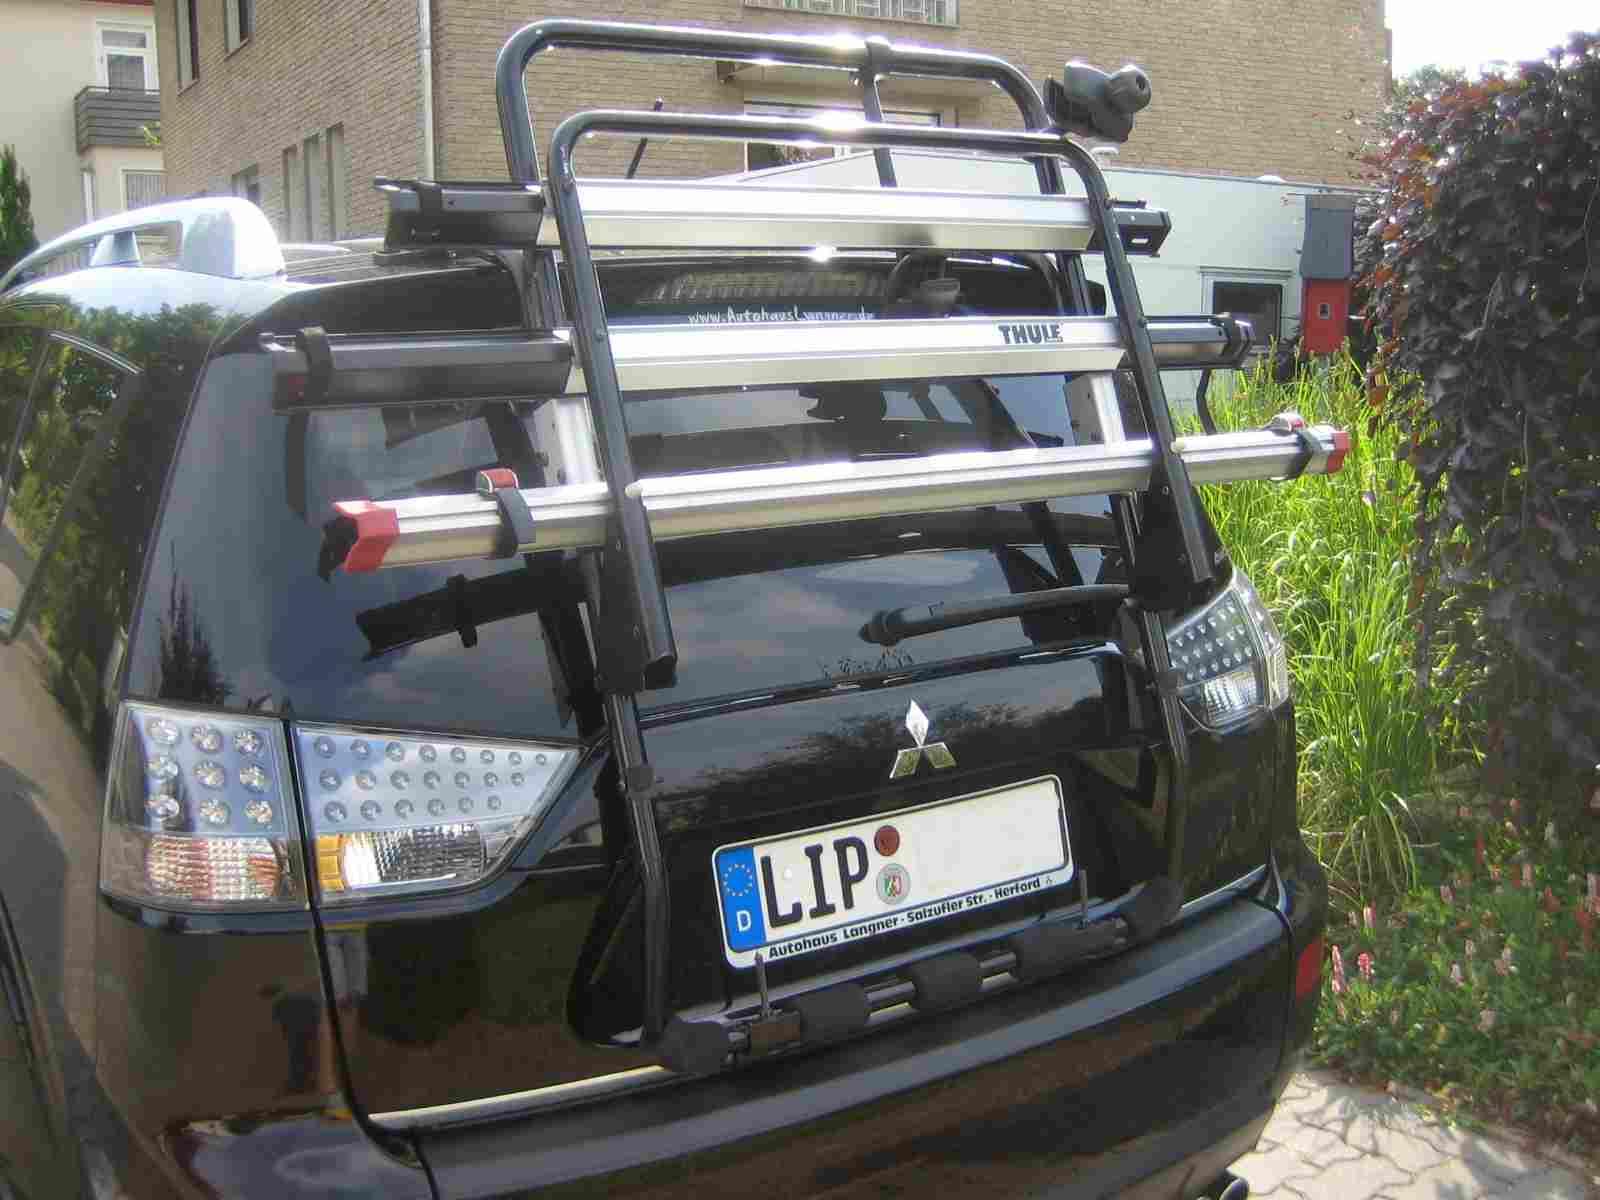 mitsubishi outlander forum :: outlander ii - benzin & diesel